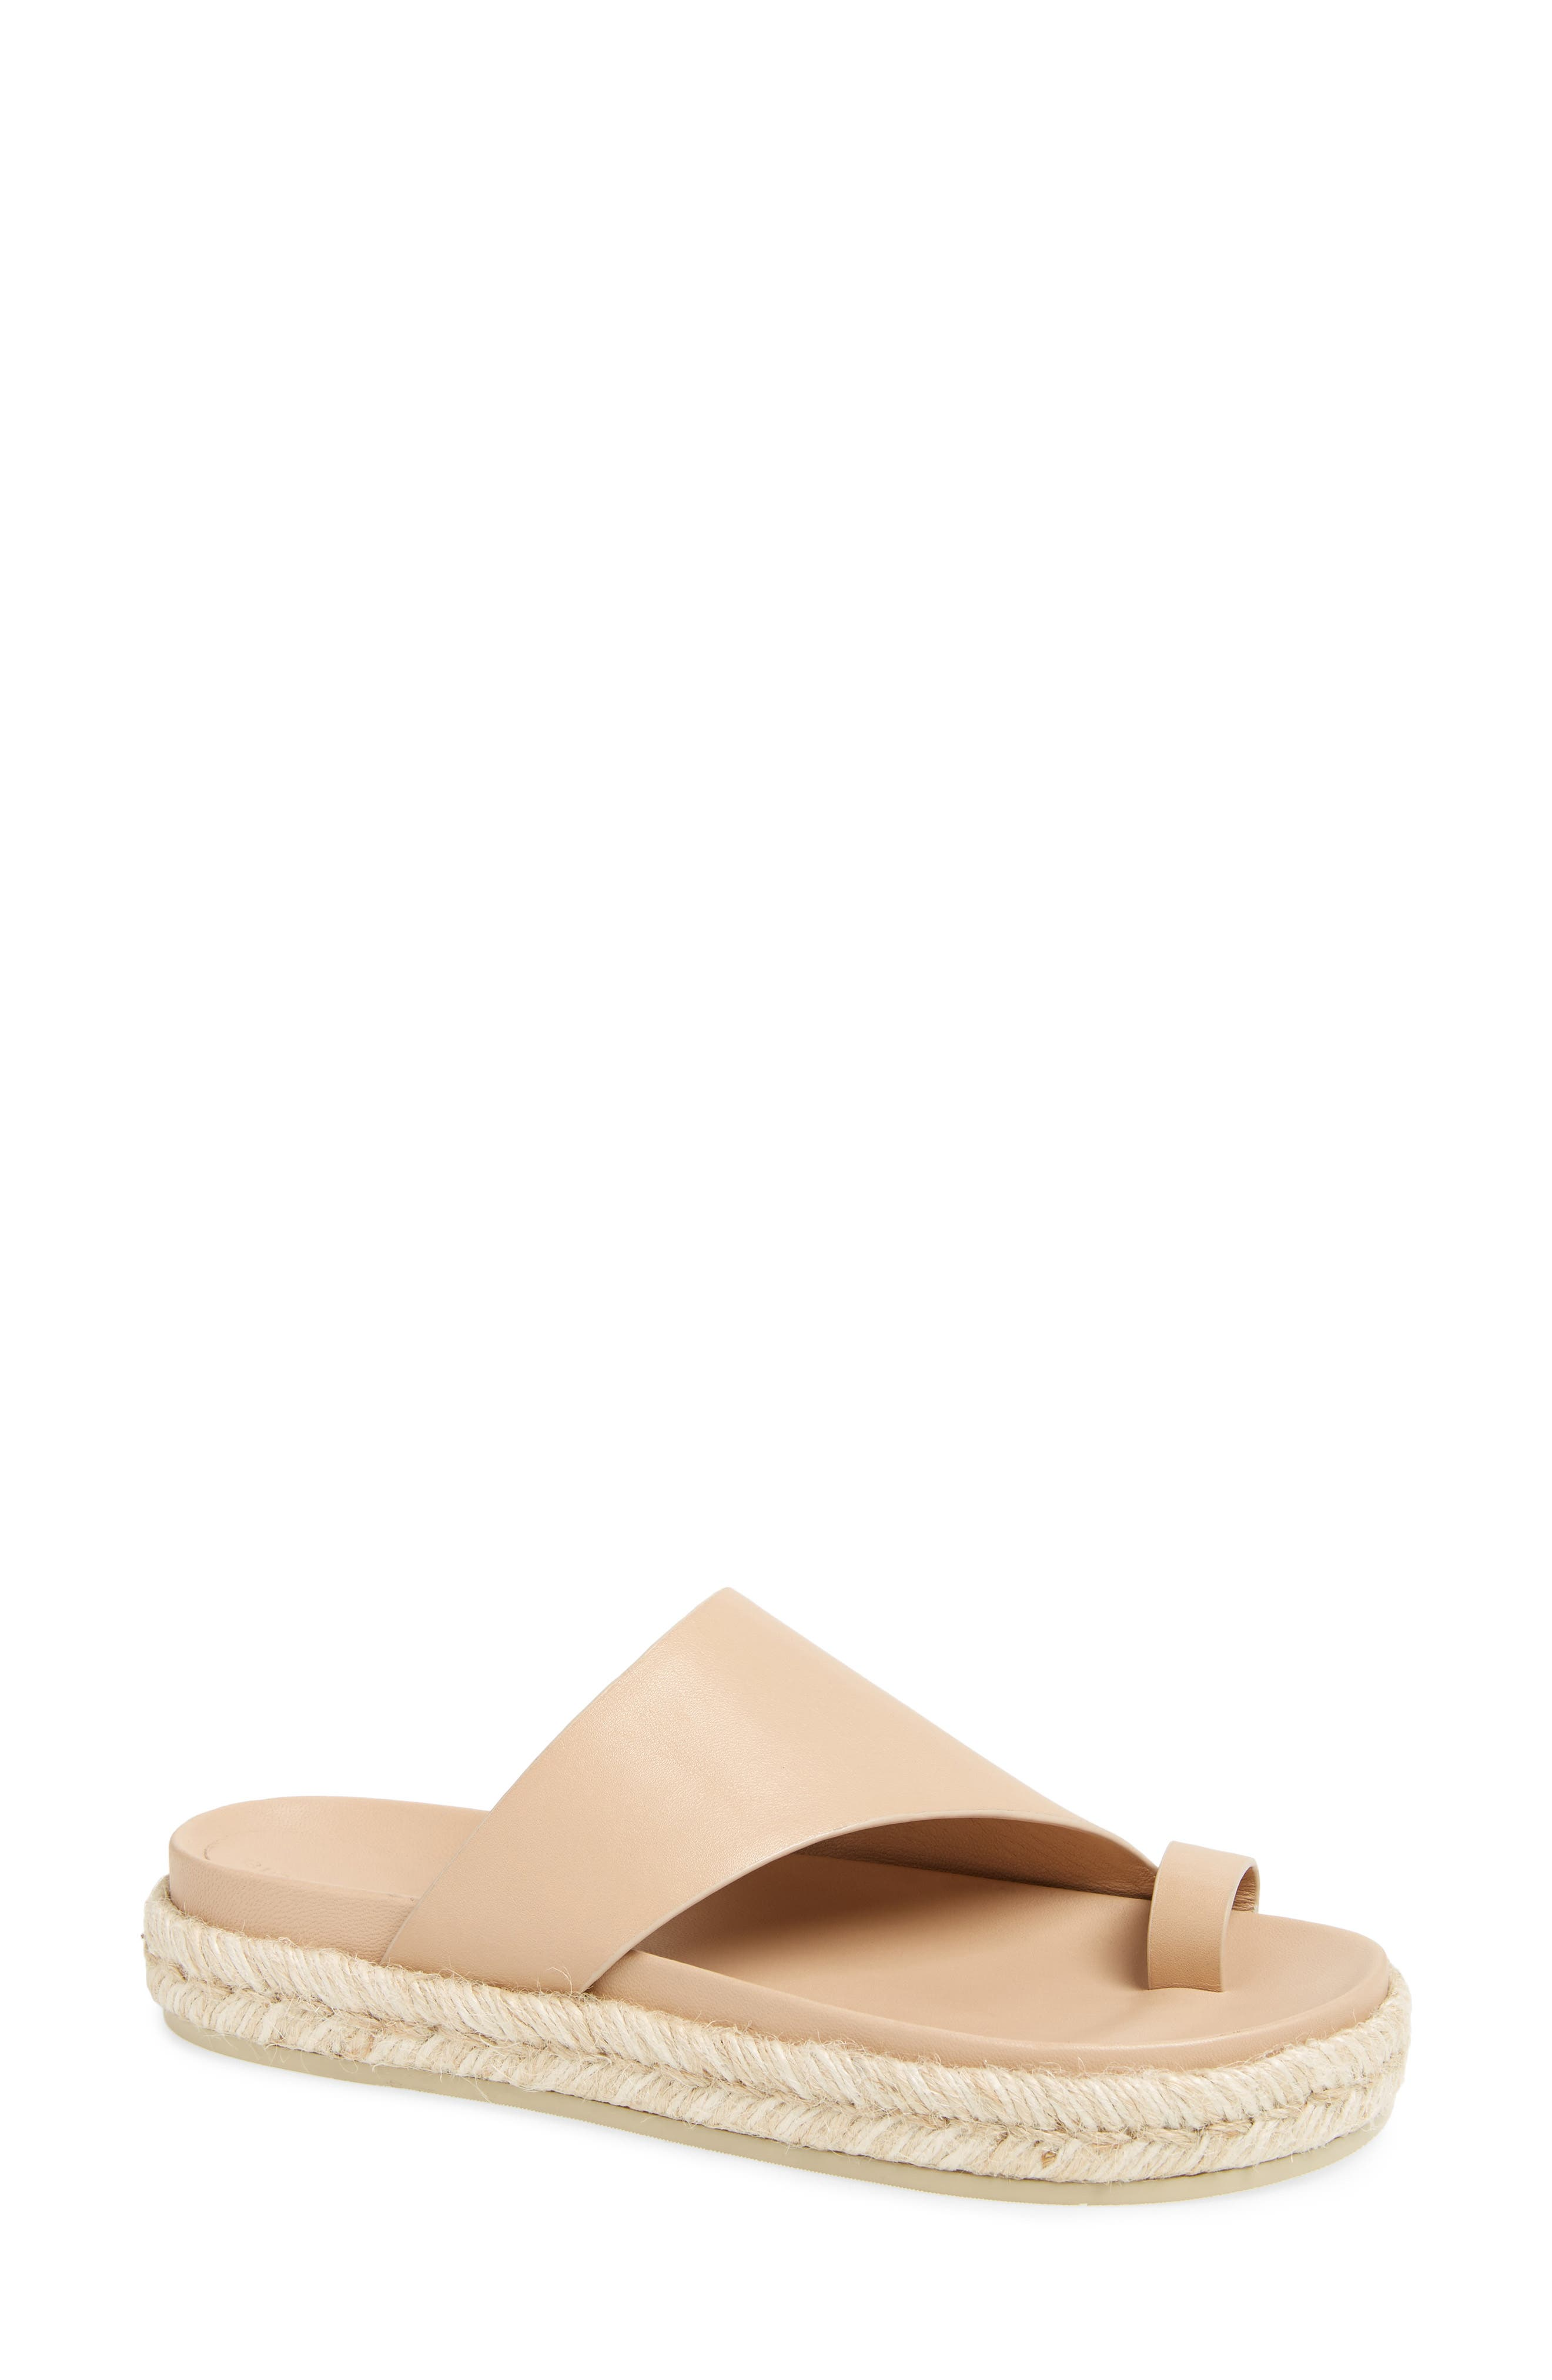 Sigerson Morrison Espadrille Toe Loop Sandal (Women)